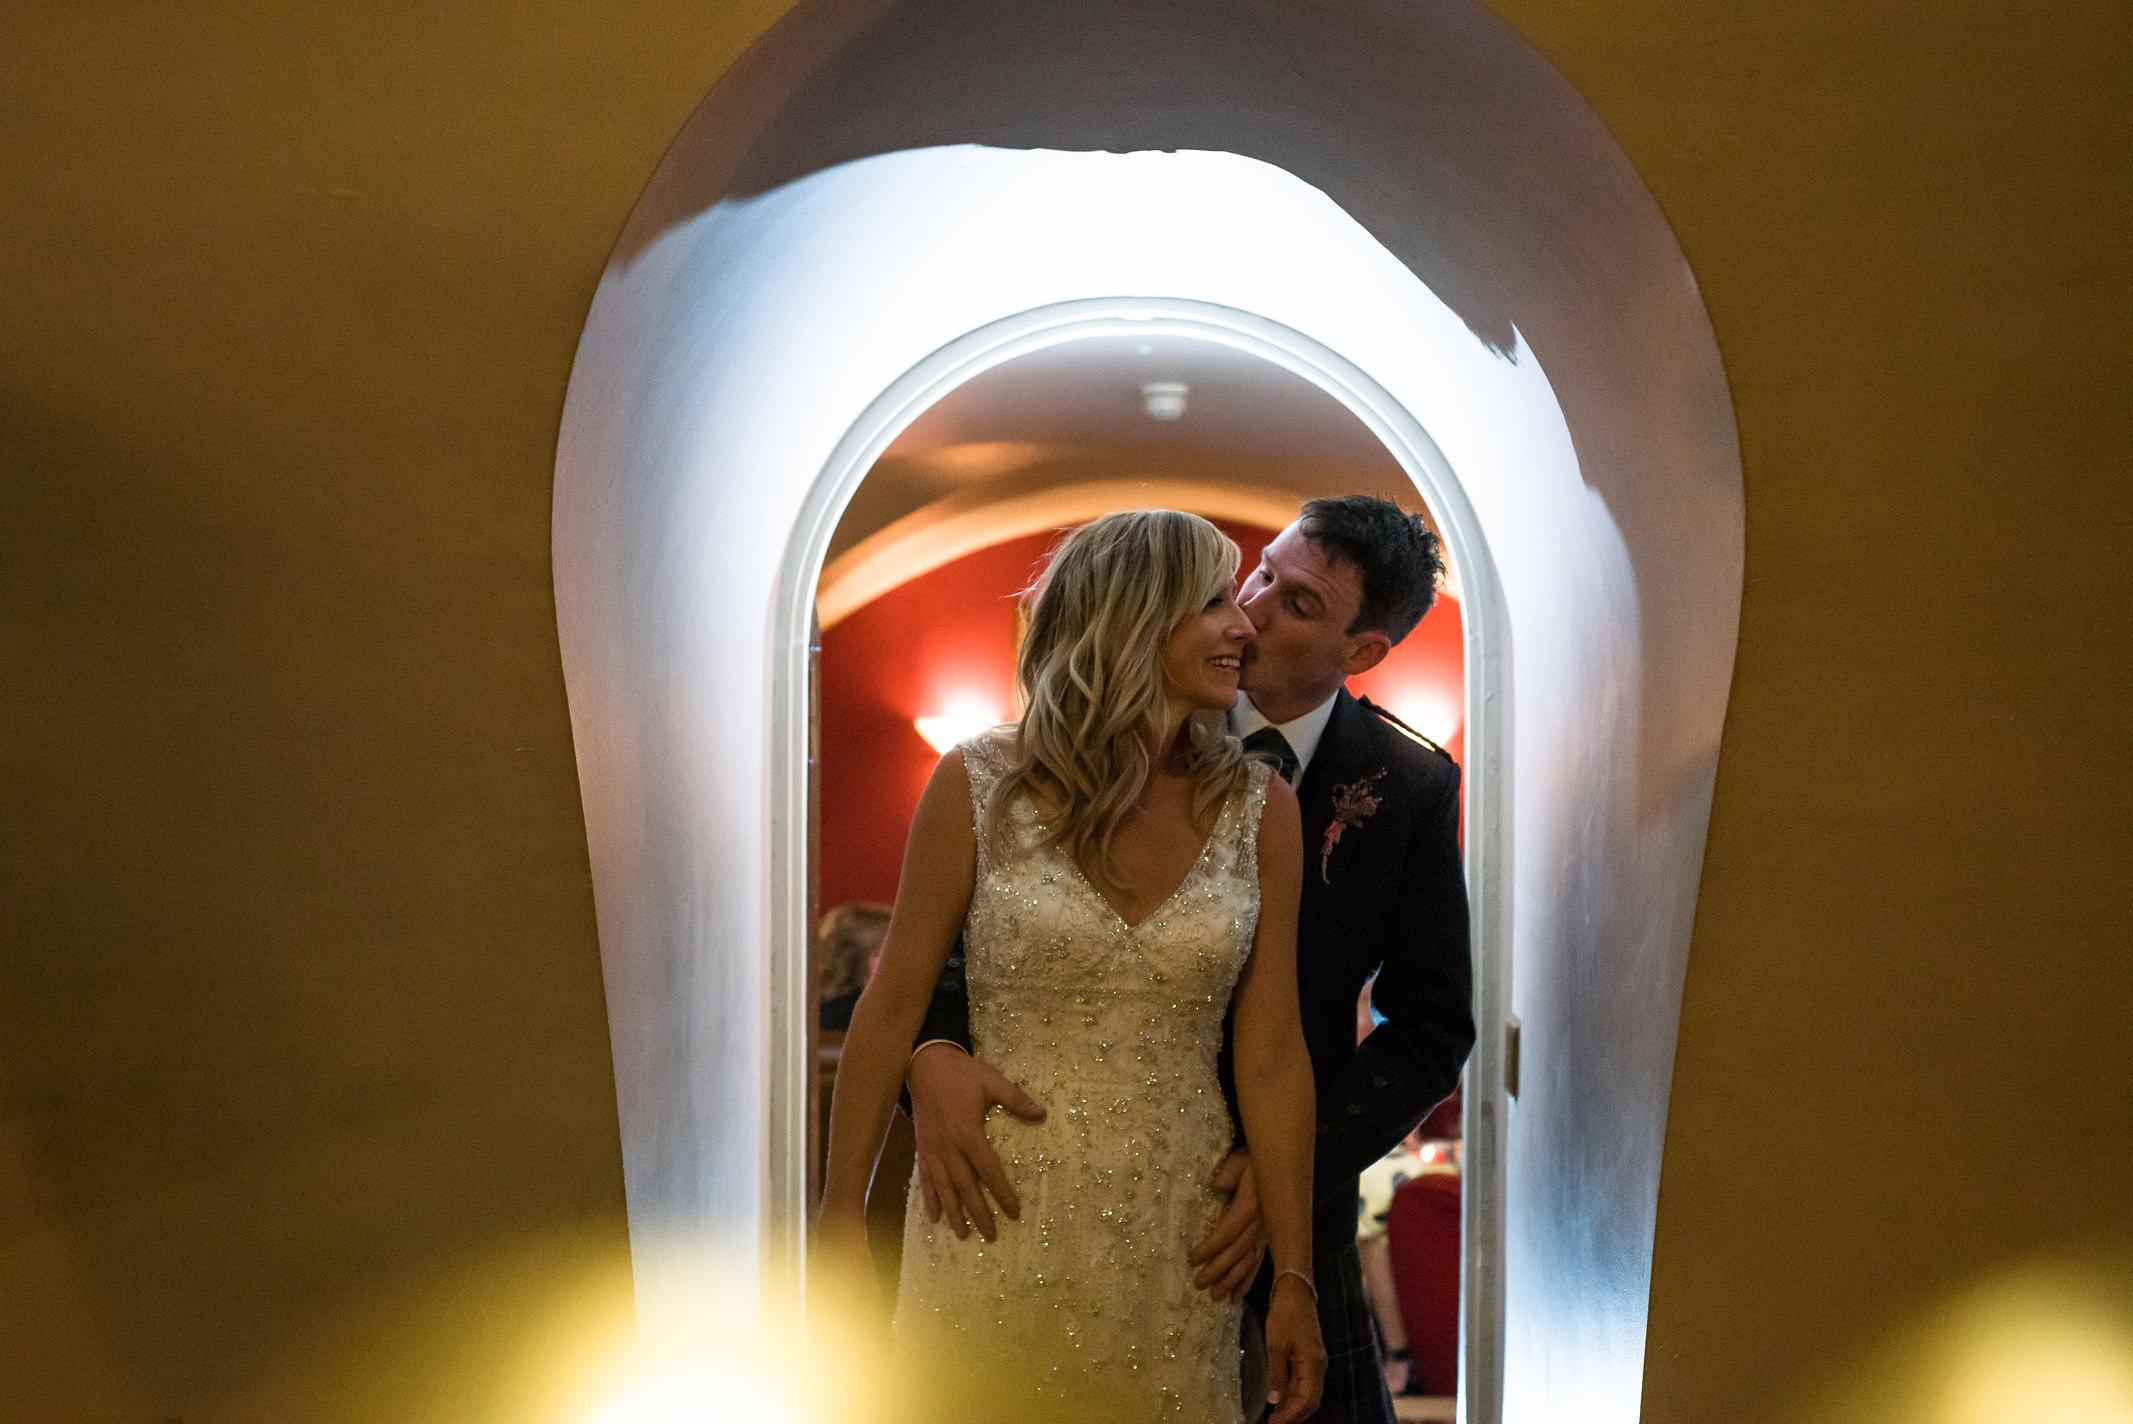 carberry-tower-edinburgh-wedding-venue-(3).jpg